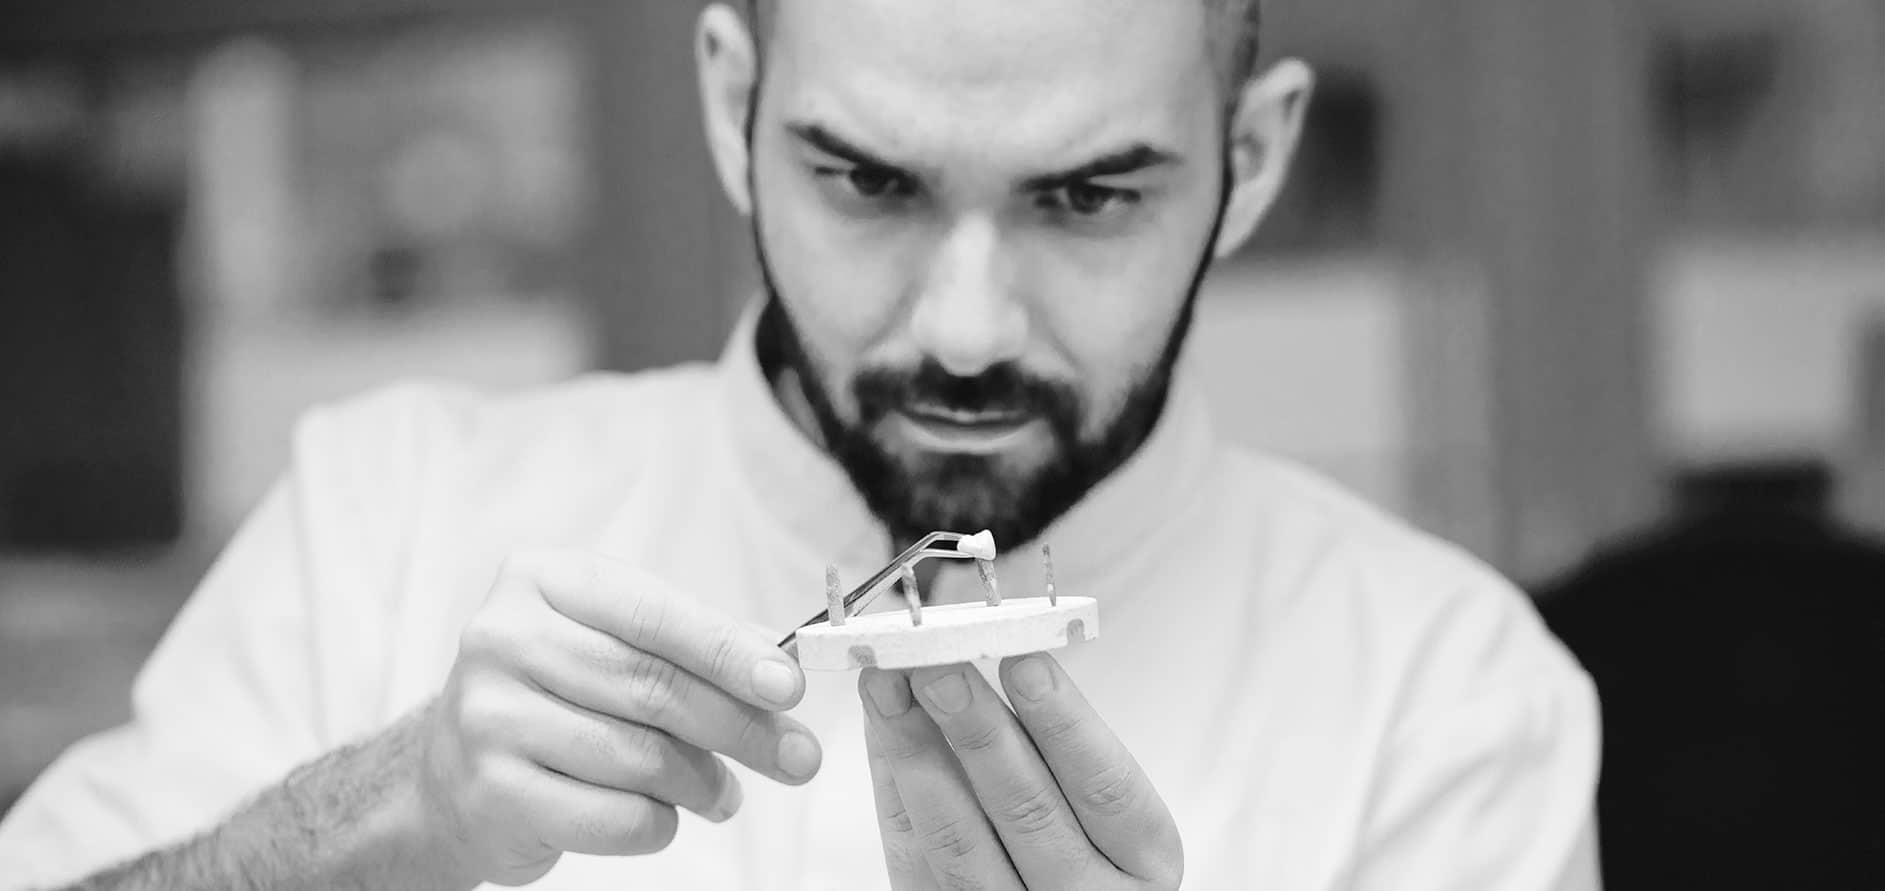 Dentiste fabricant une prothèse dentaire